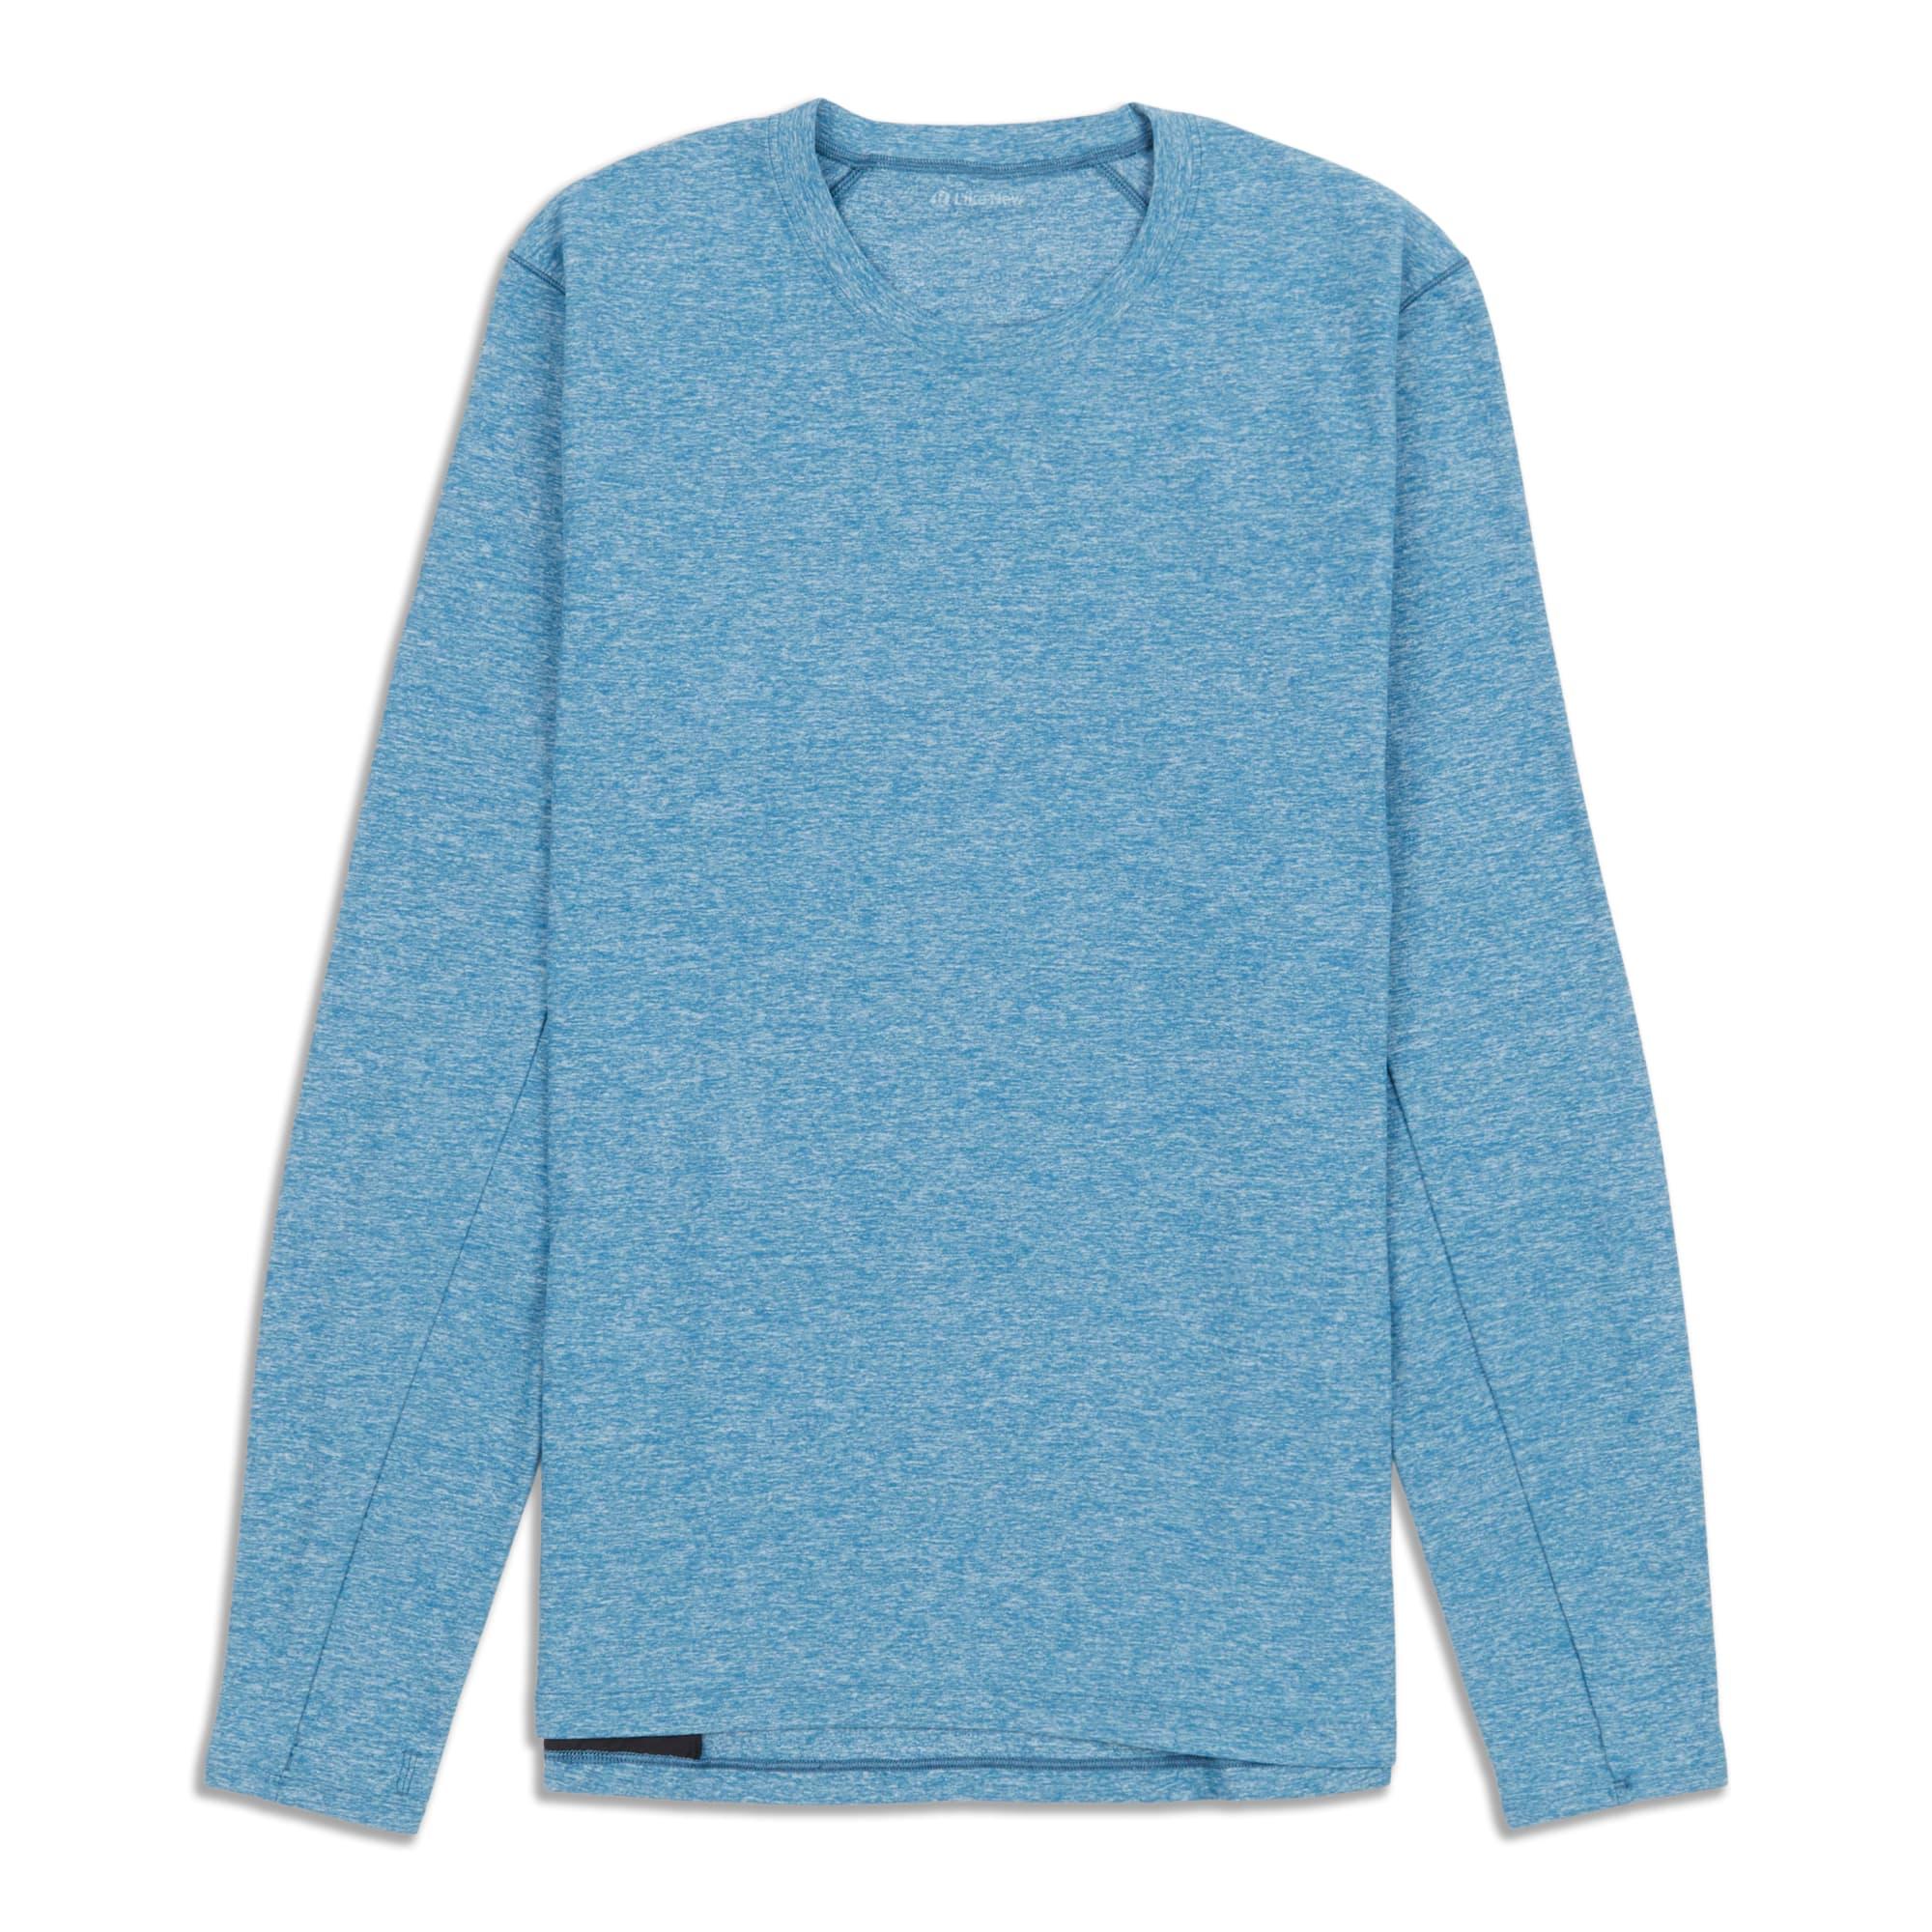 Main product image: Surge Warm Long Sleeve Shirt - Resale